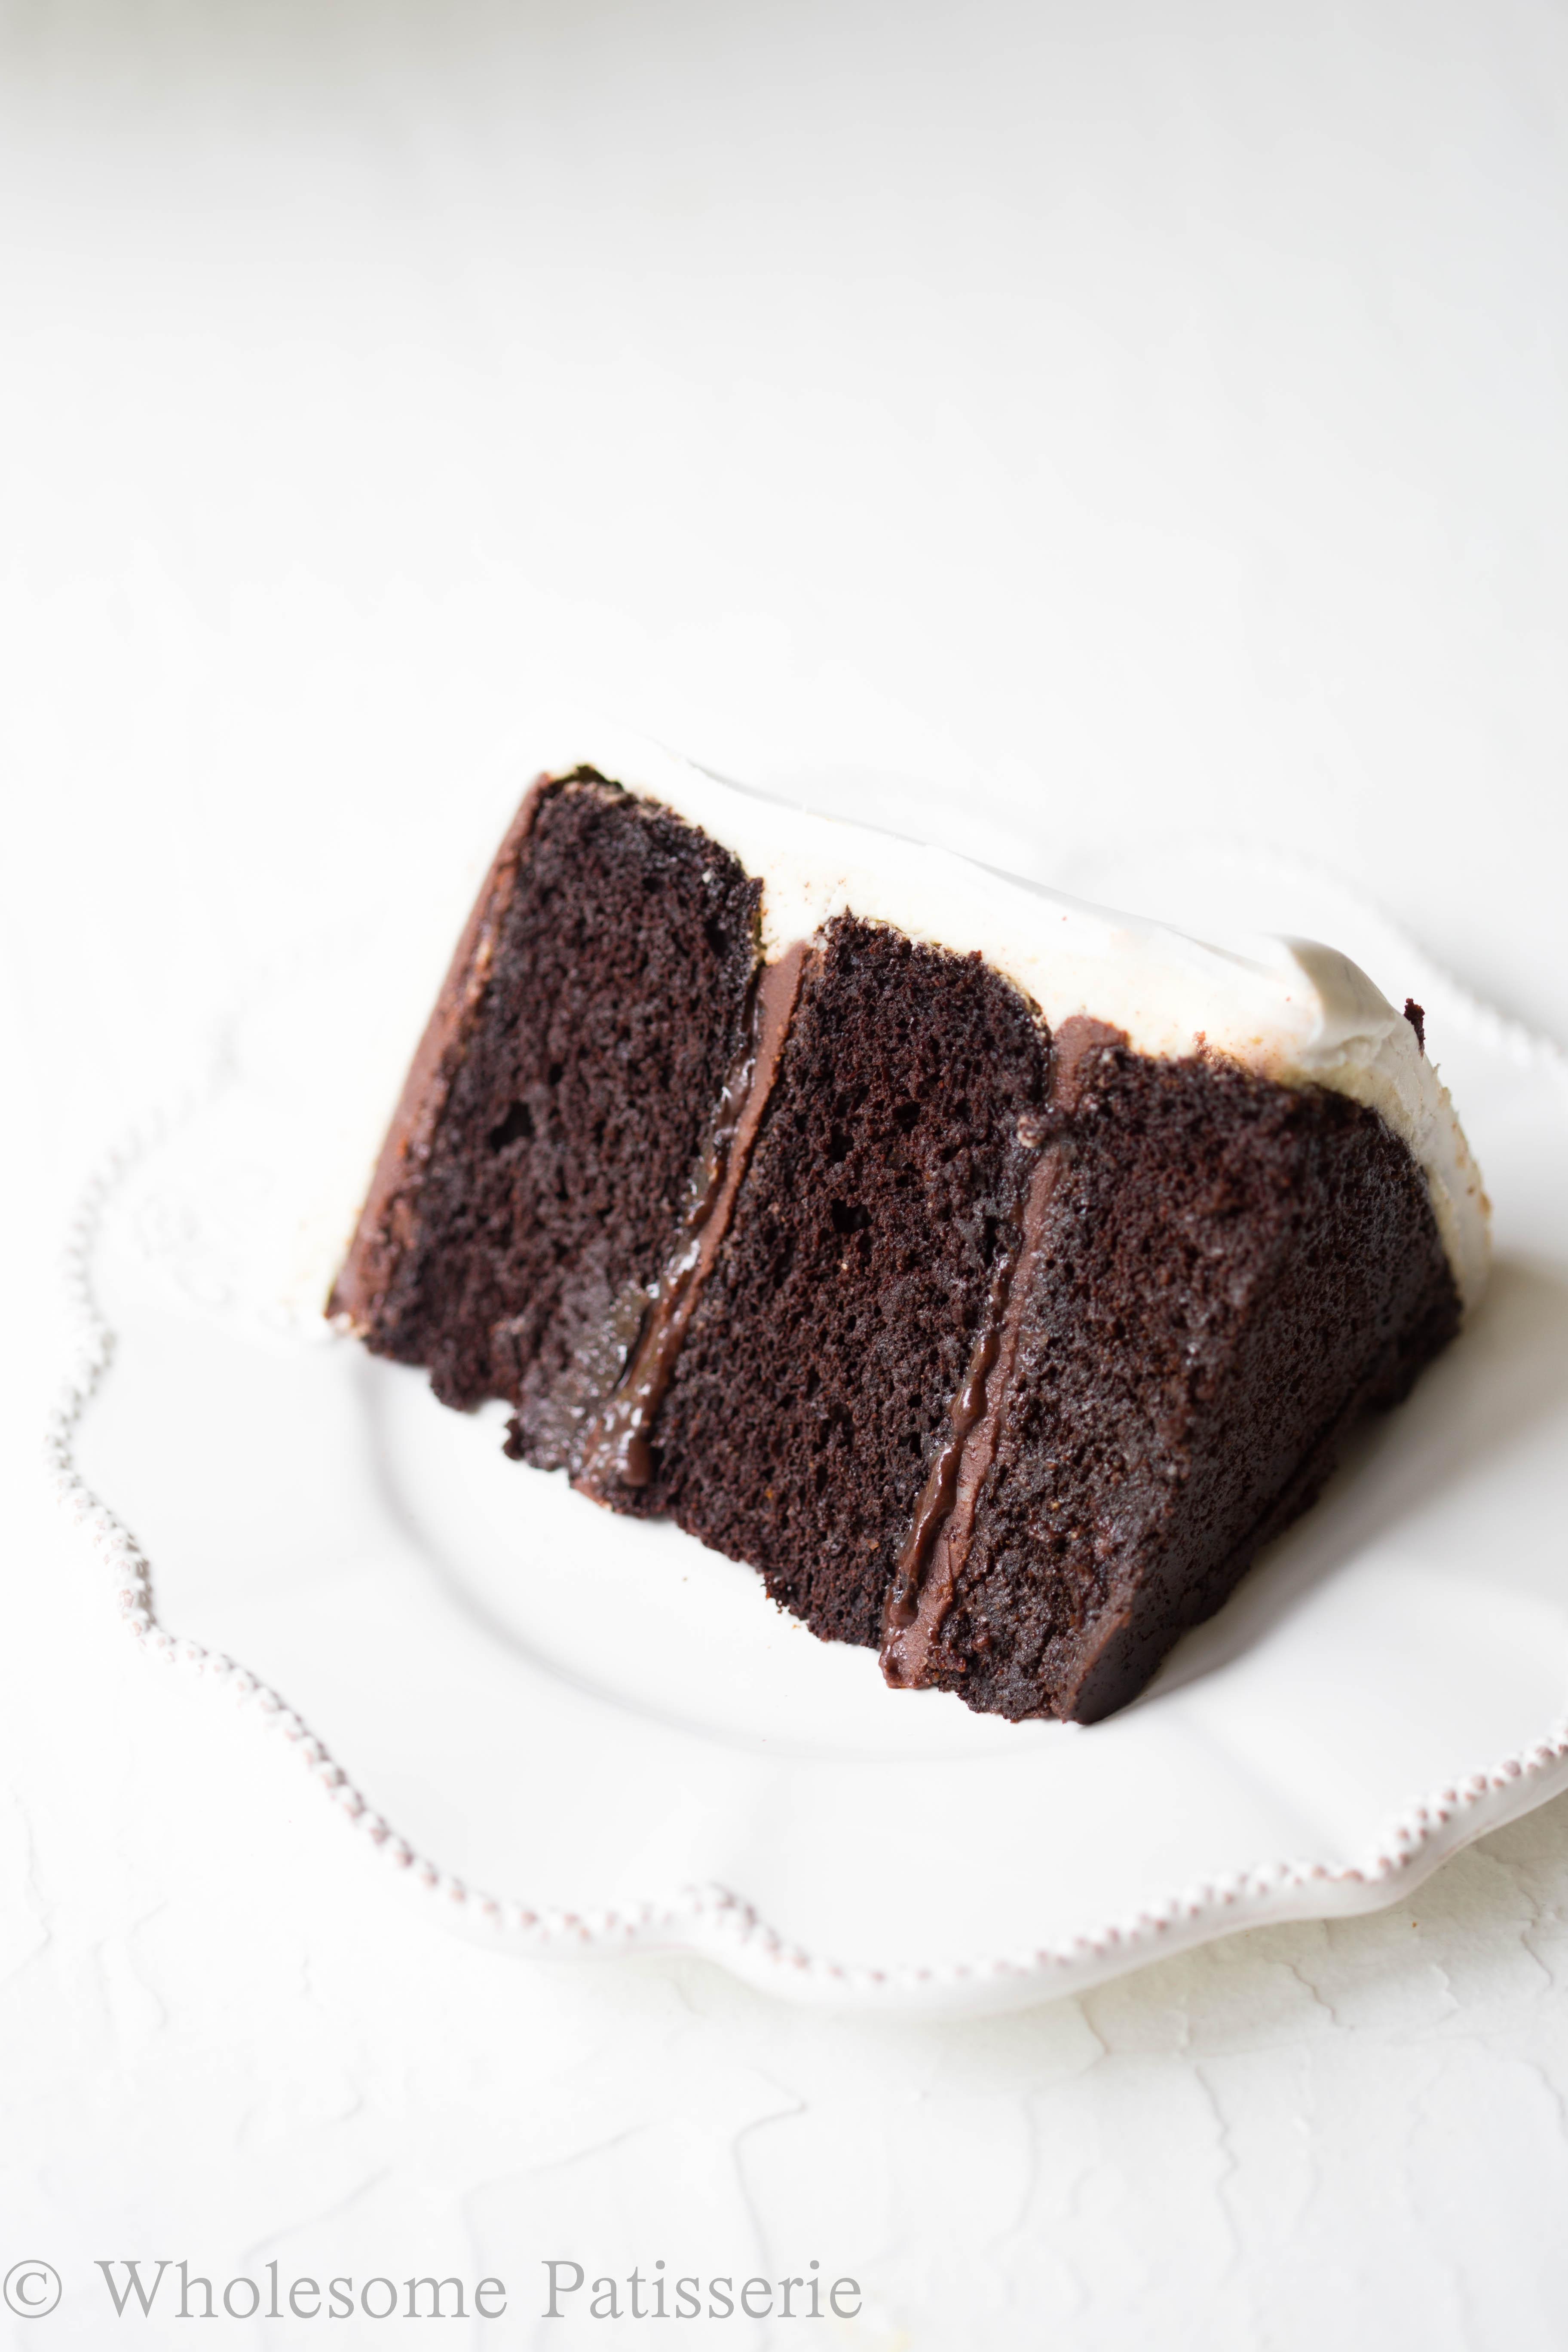 Chocolate Marble Fondant Cake